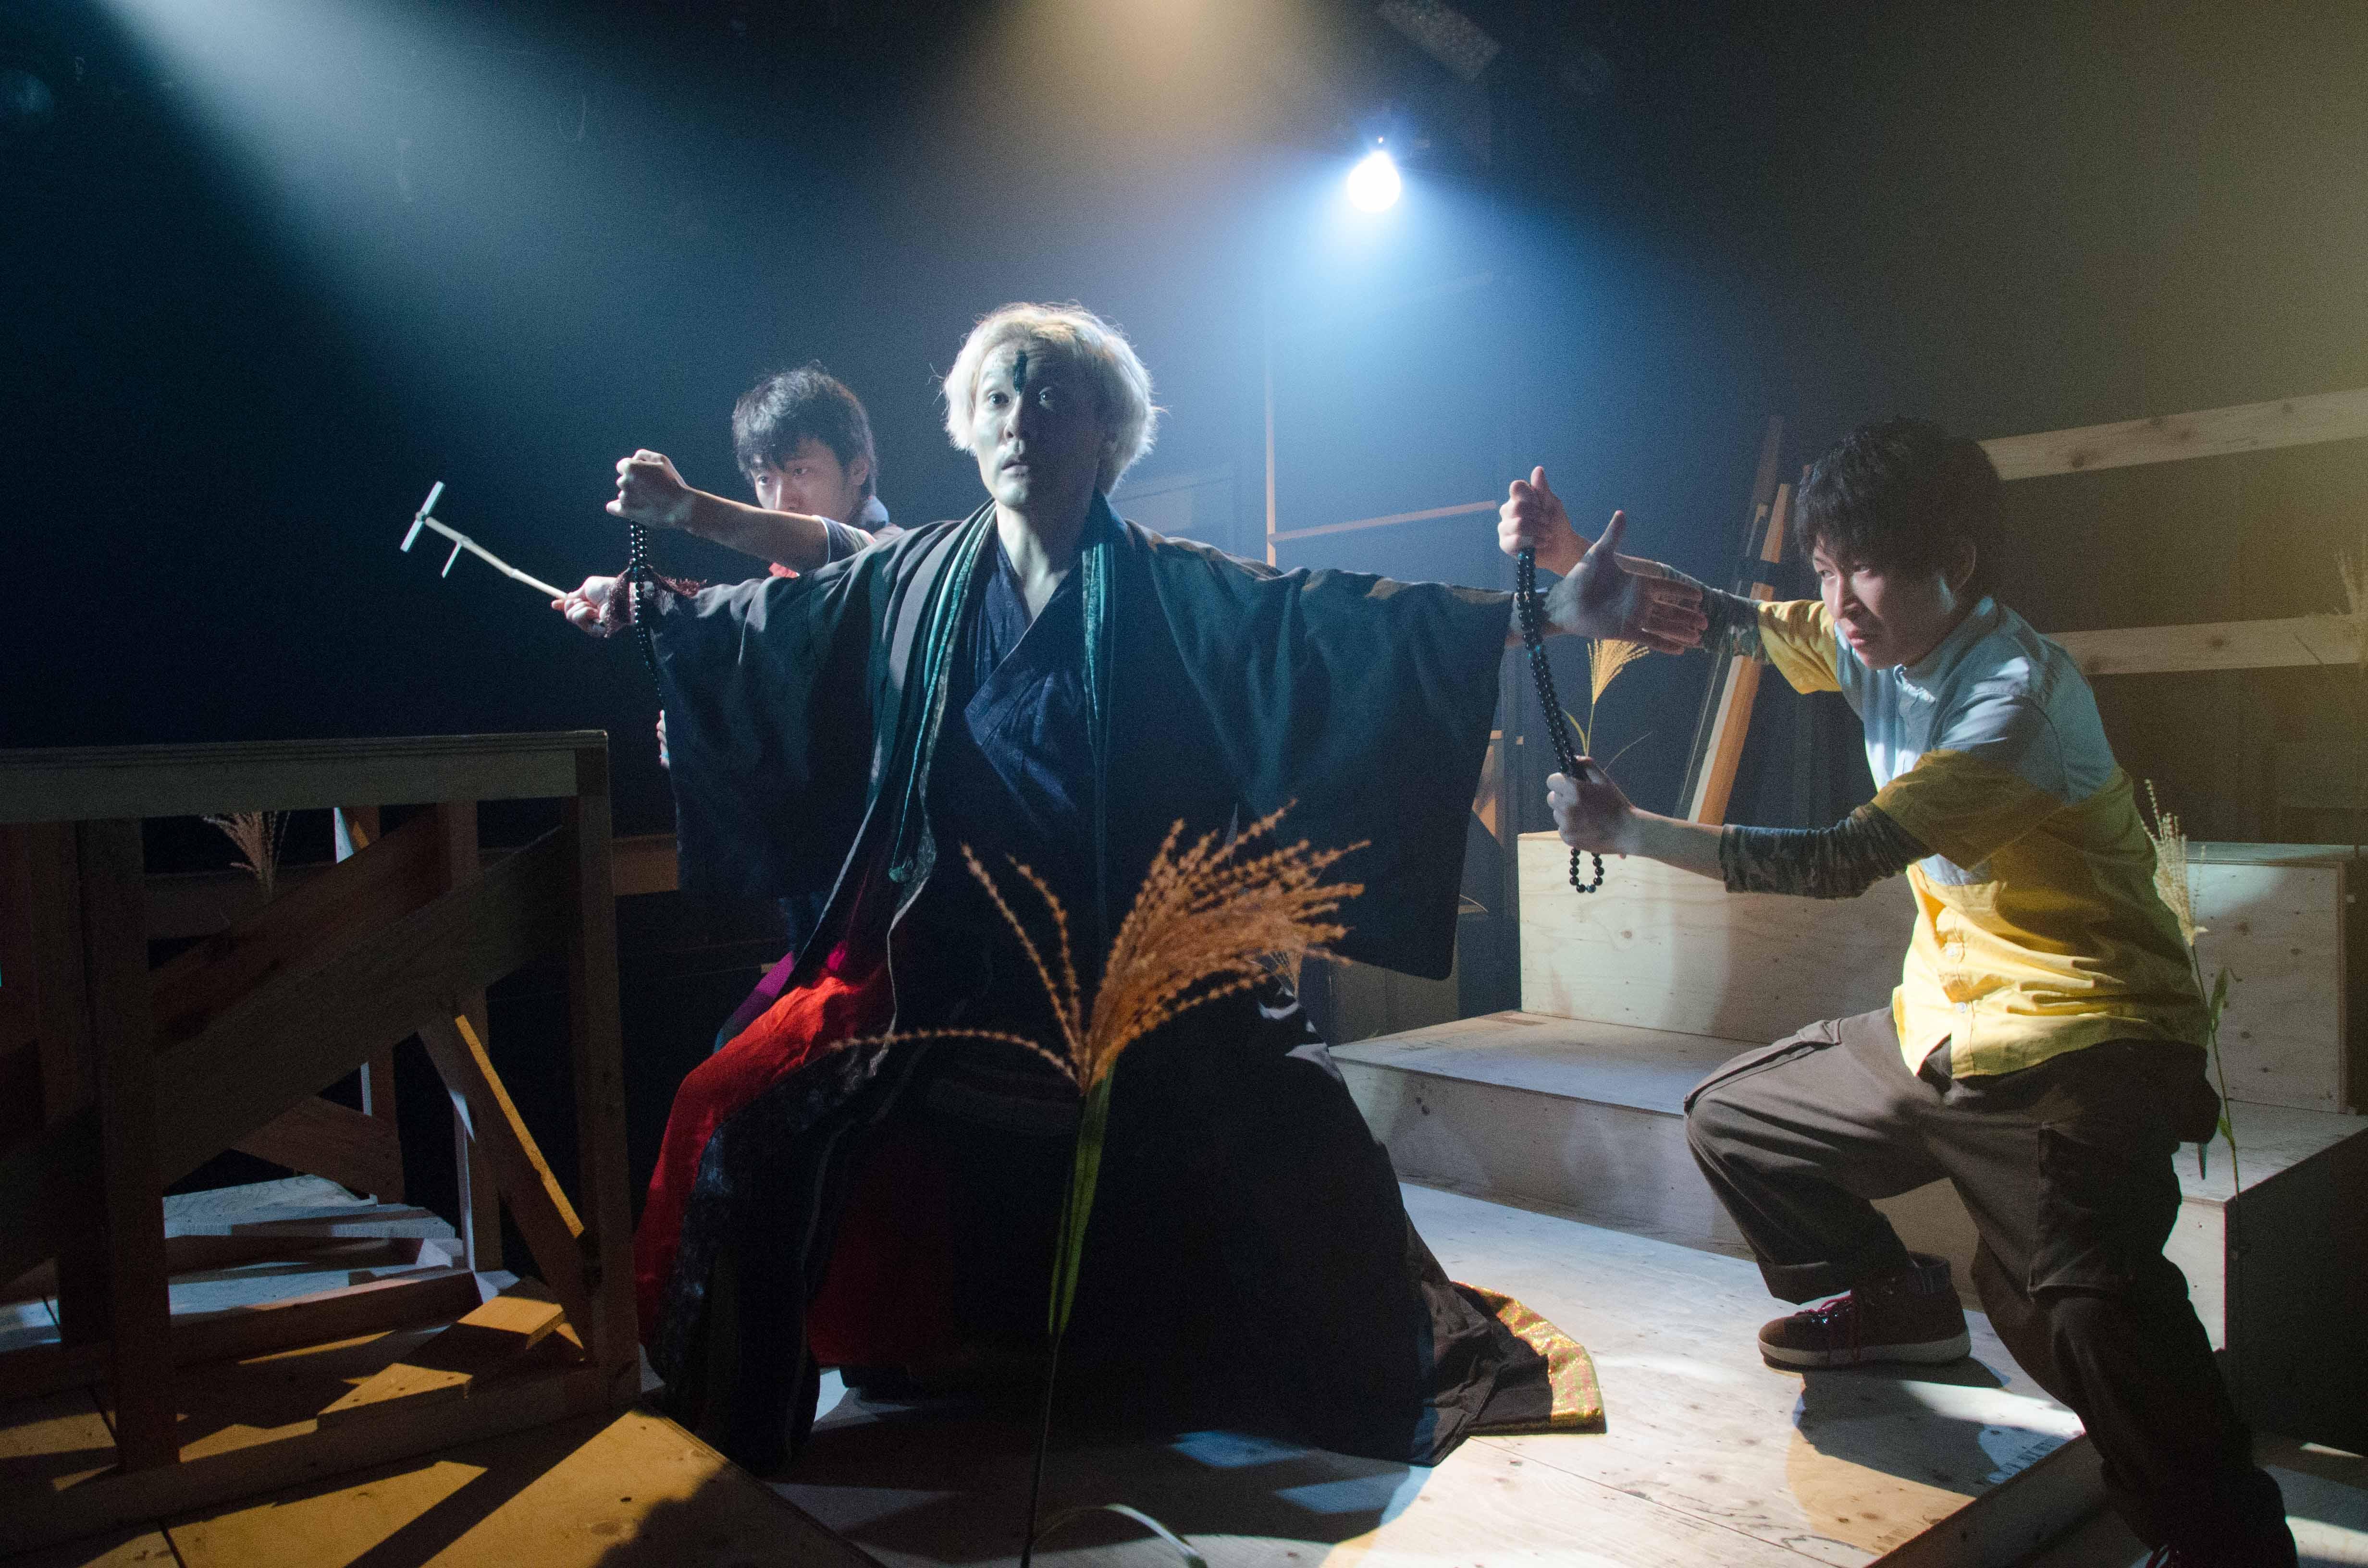 『黒塚』2013年|十六夜吉田町スタジオ|